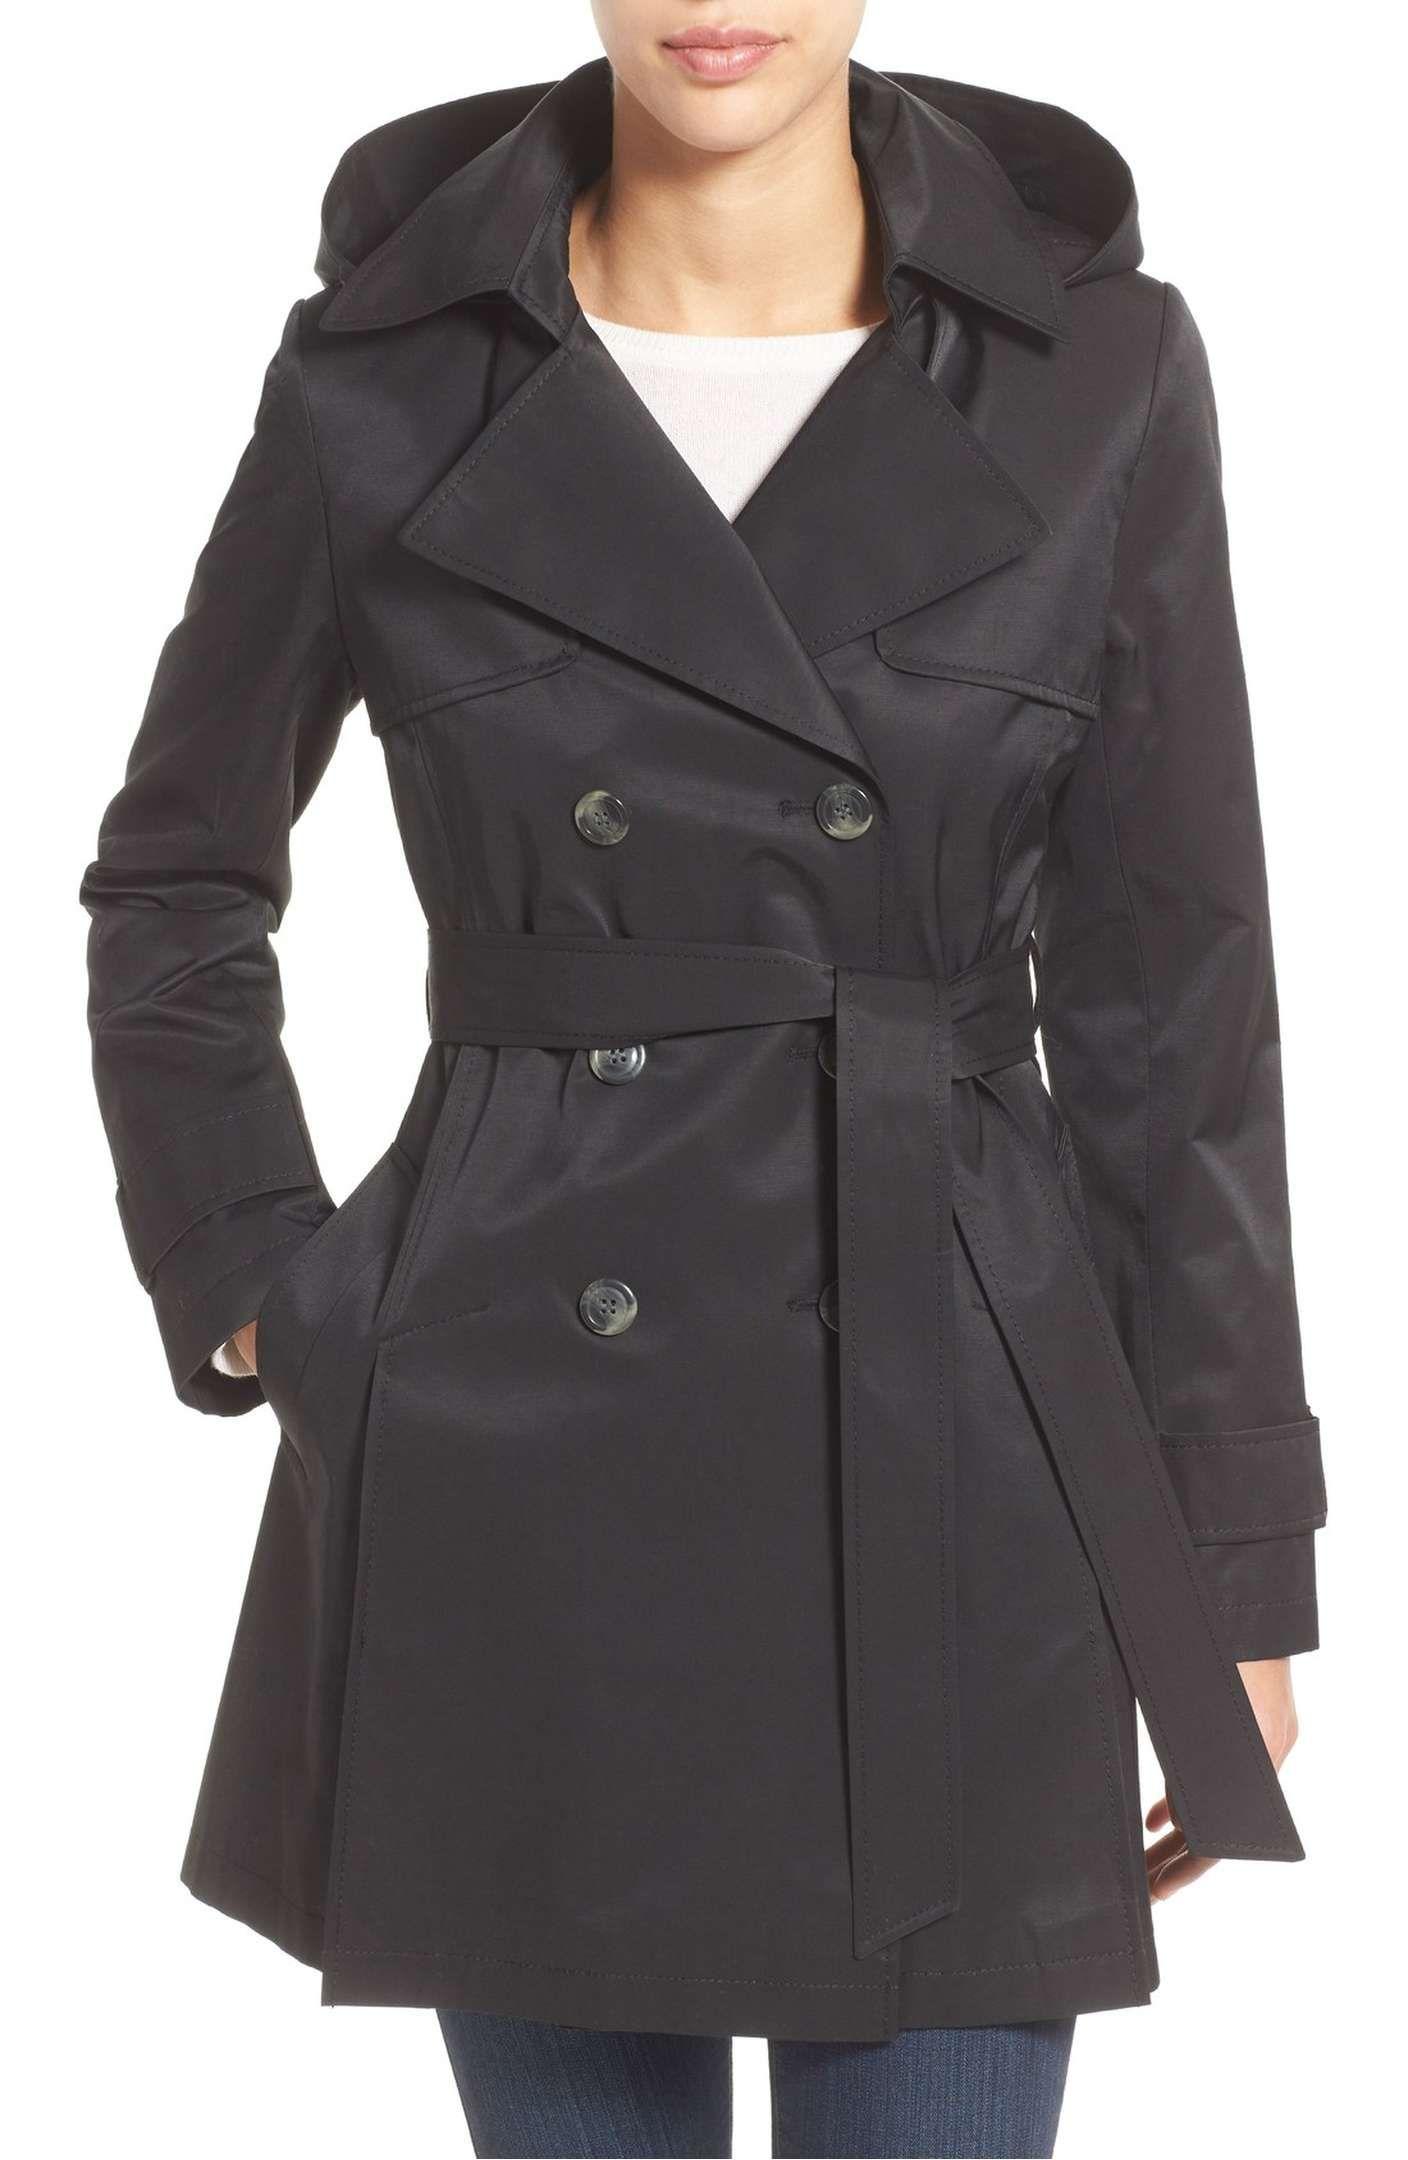 Spring Showers Bring Cute Rain Boots Trench Coats Women Trench Coat Nordstrom Coats [ 2160 x 1408 Pixel ]